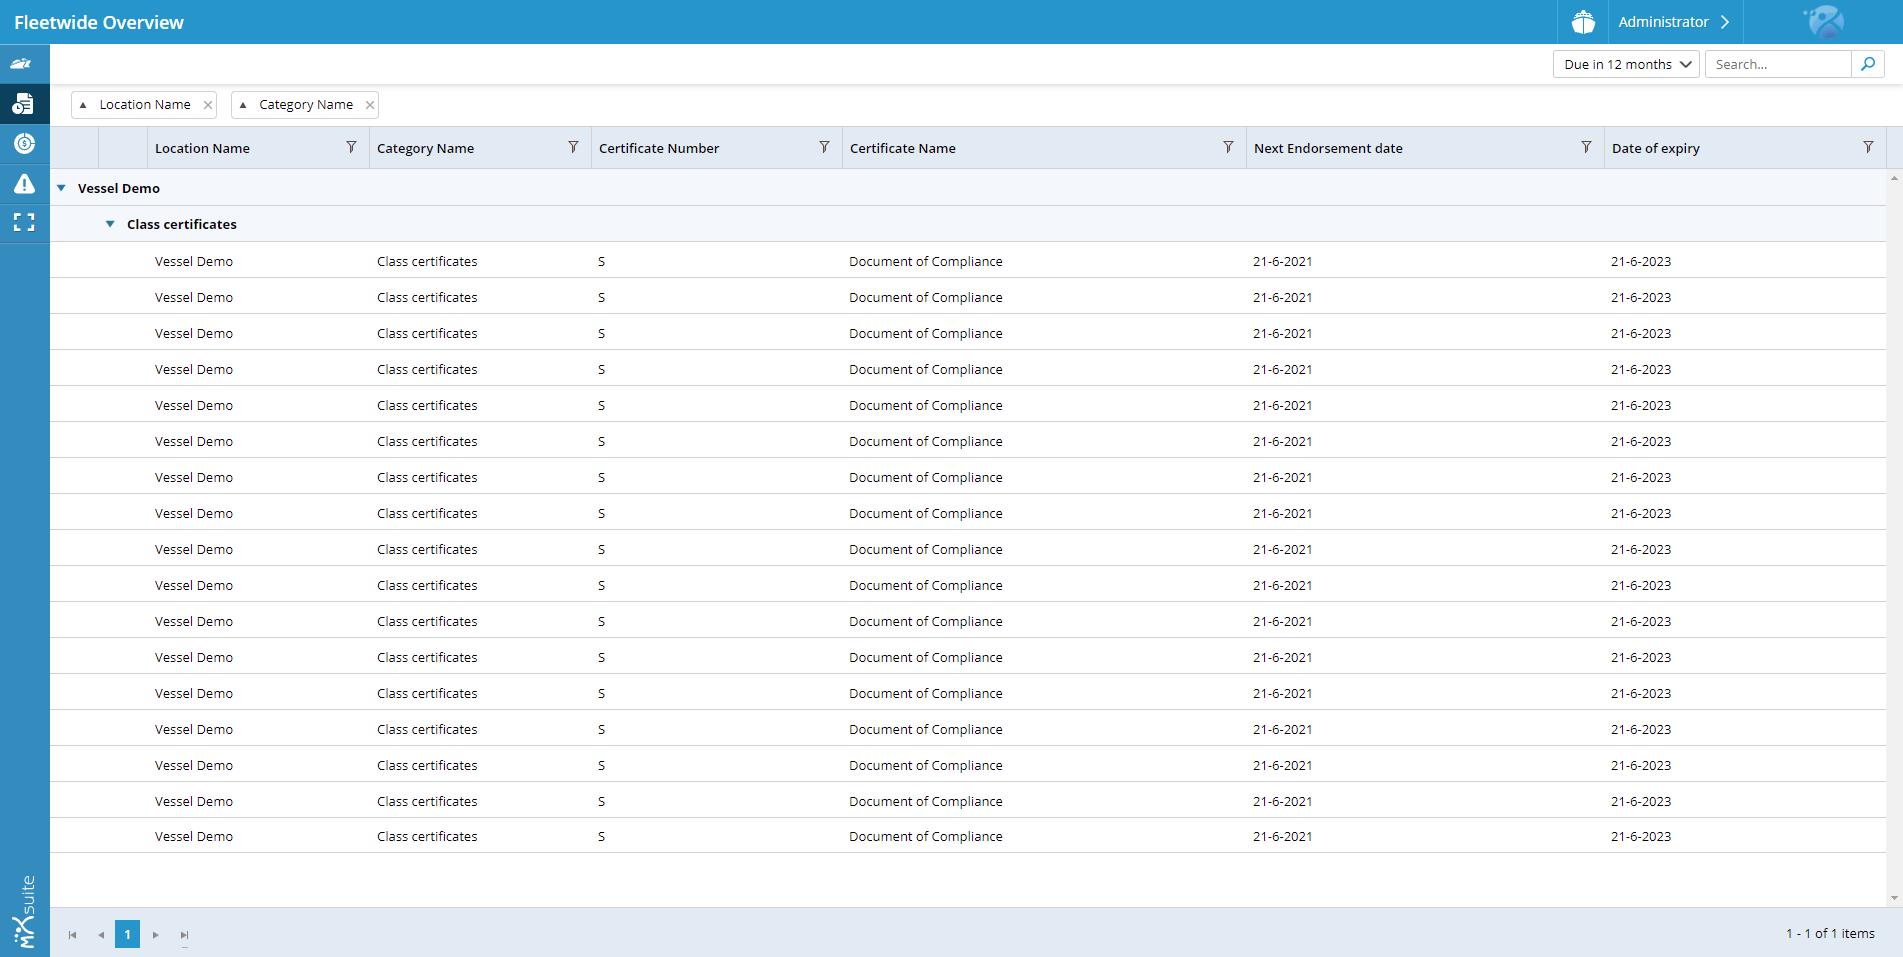 OfficeFleetWideOverviewCertificateExpiry